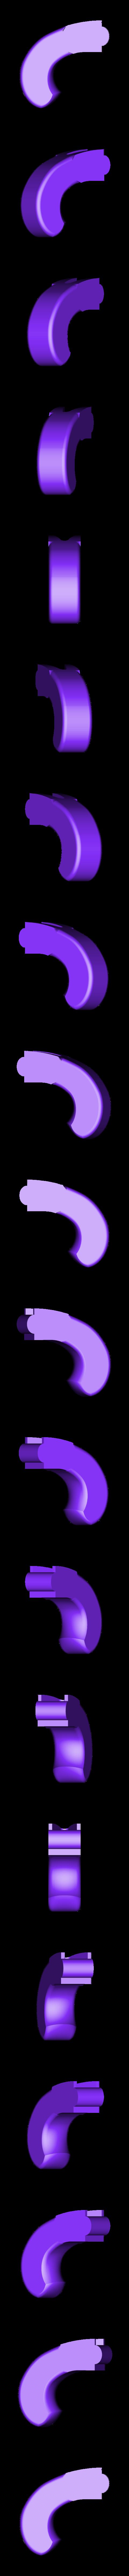 1_DuckfootGun_Handle.stl Download free STL file Duck's foot gun • Object to 3D print, Snorri